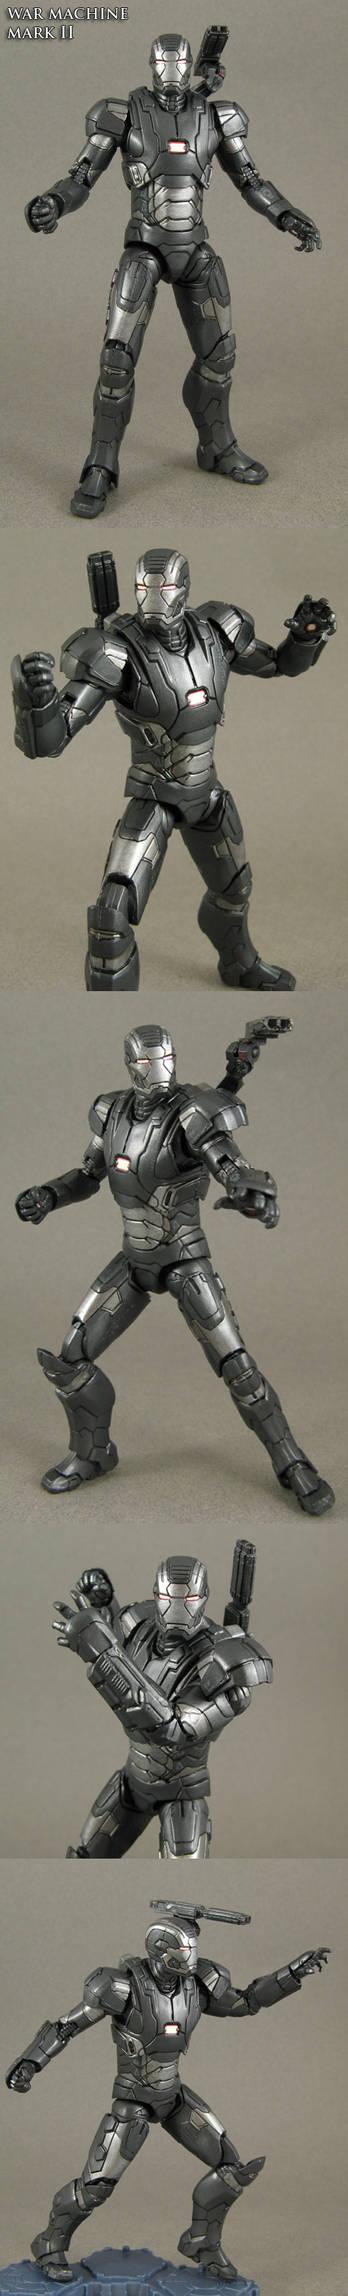 Iron man 3 War Machine mark II custom figure